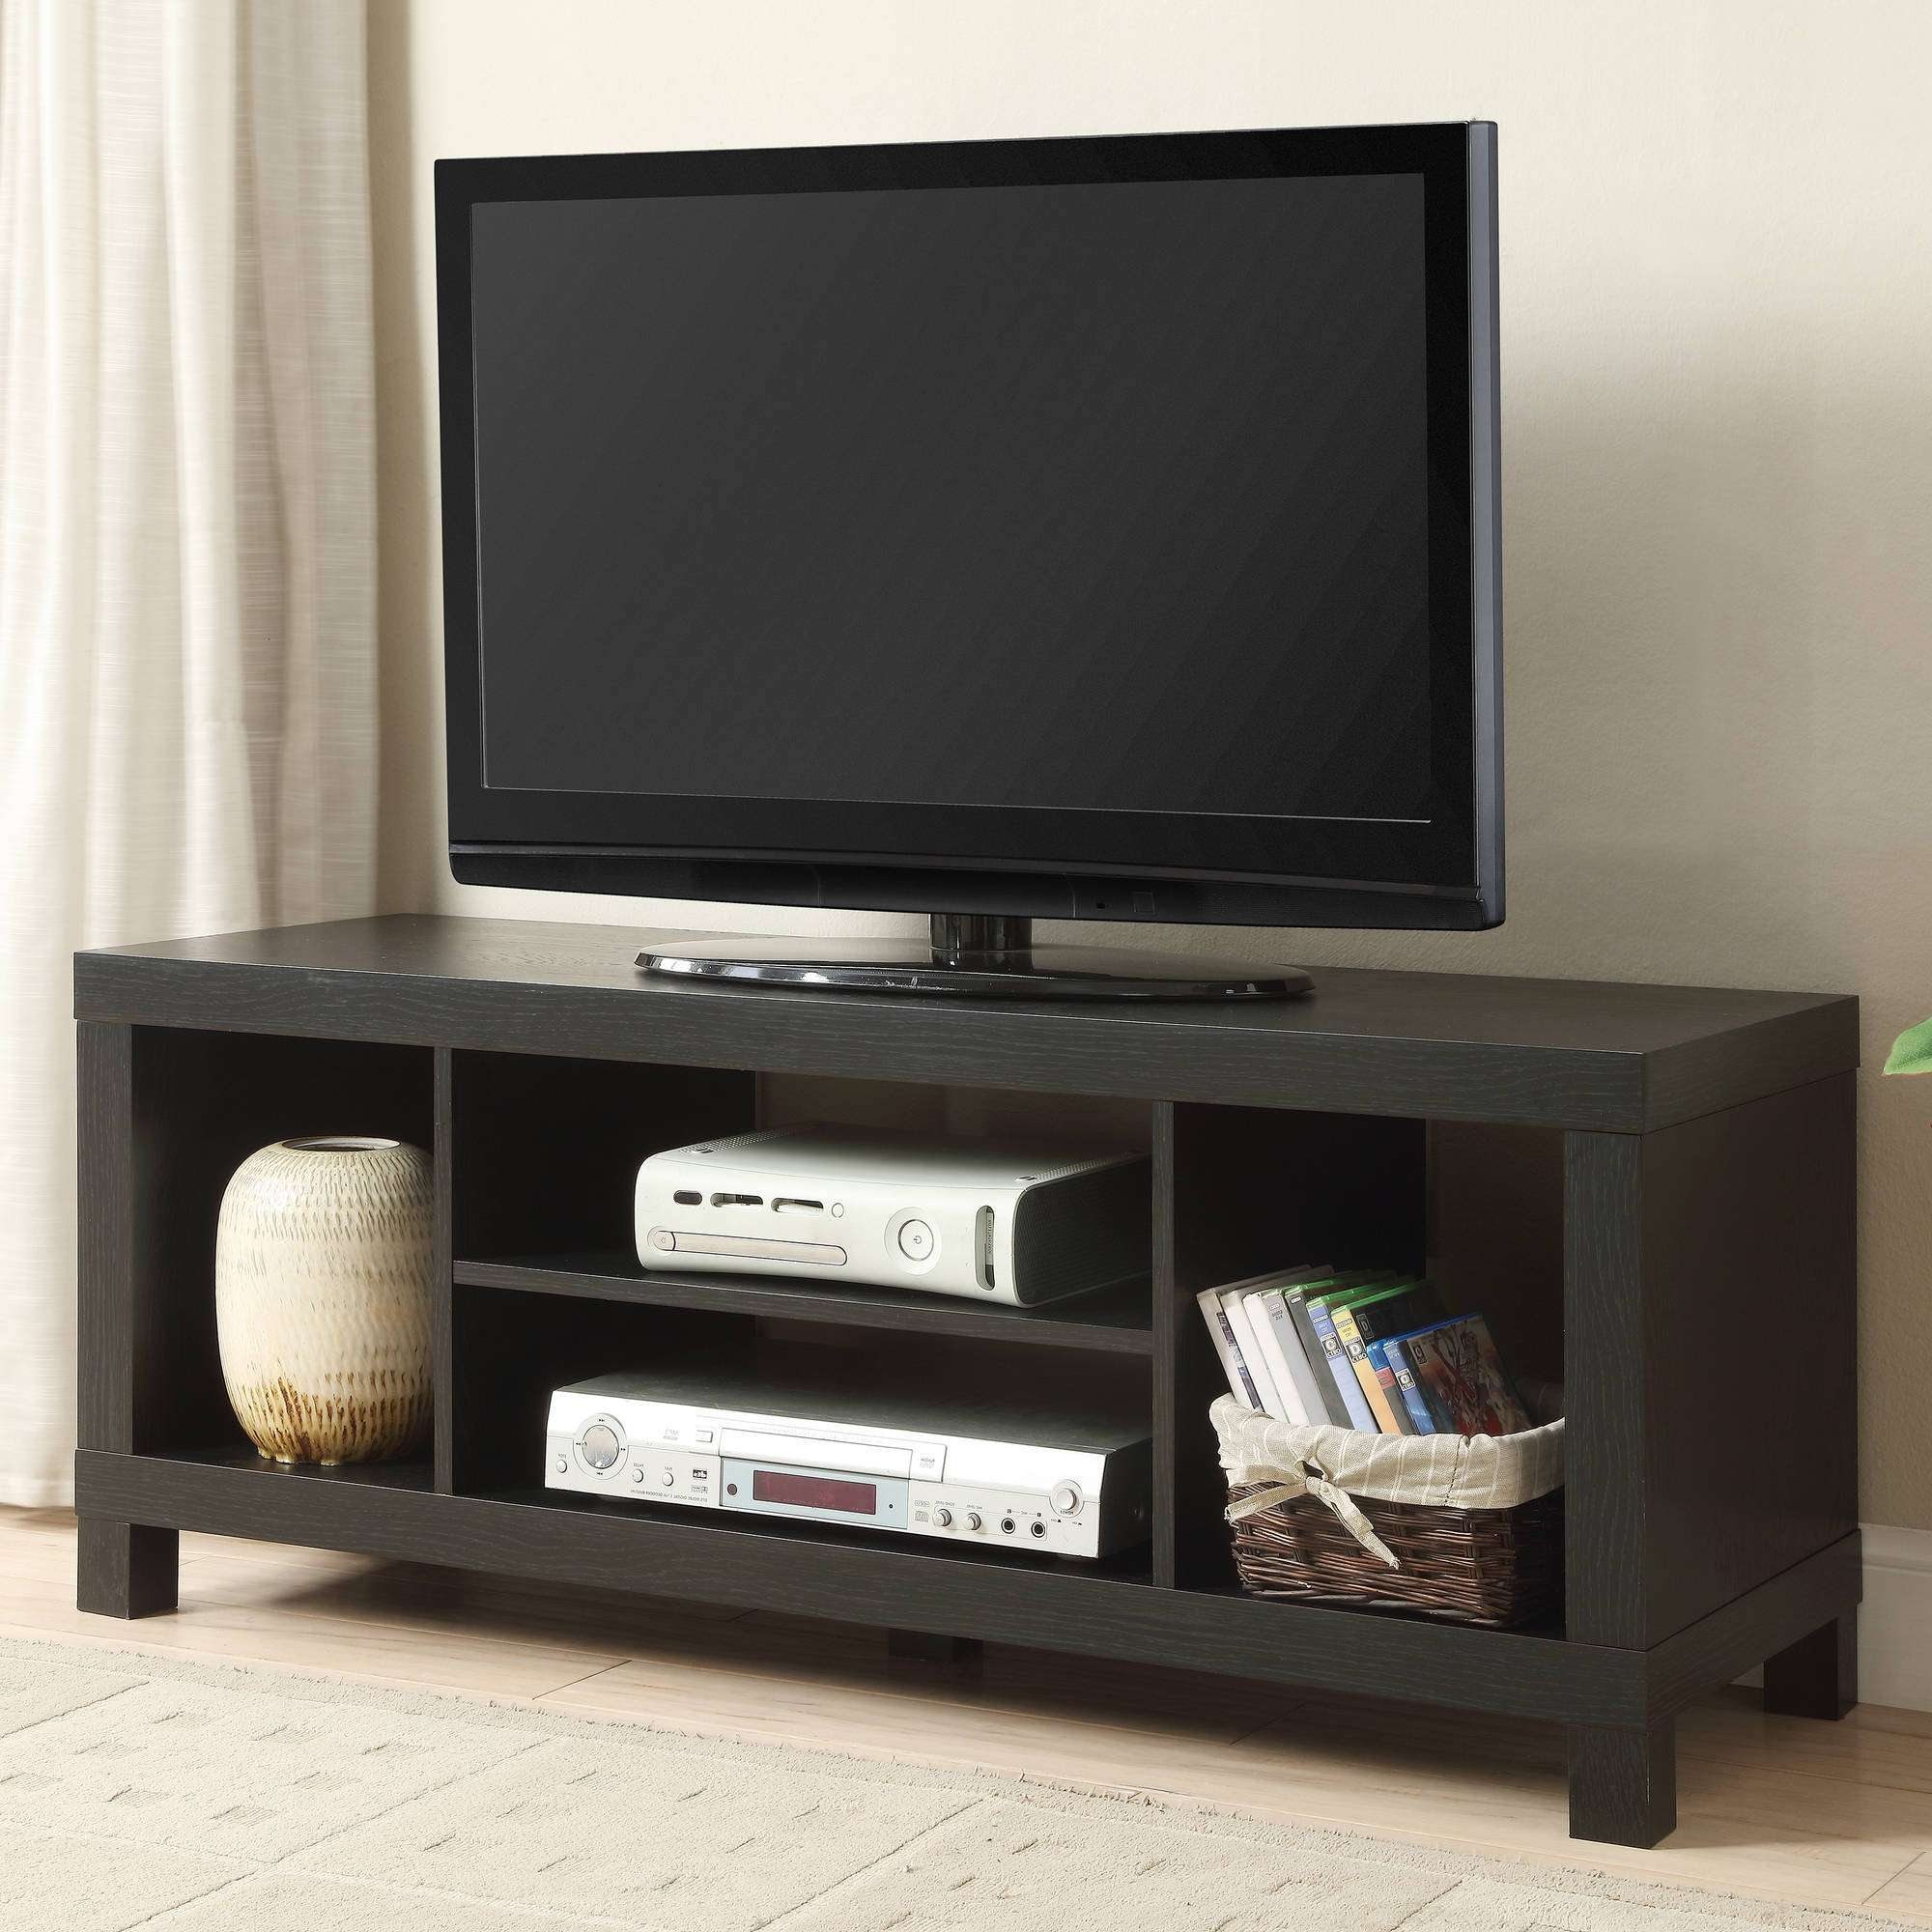 Tv Stands – Walmart Regarding Unique Tv Stands For Flat Screens (View 11 of 15)